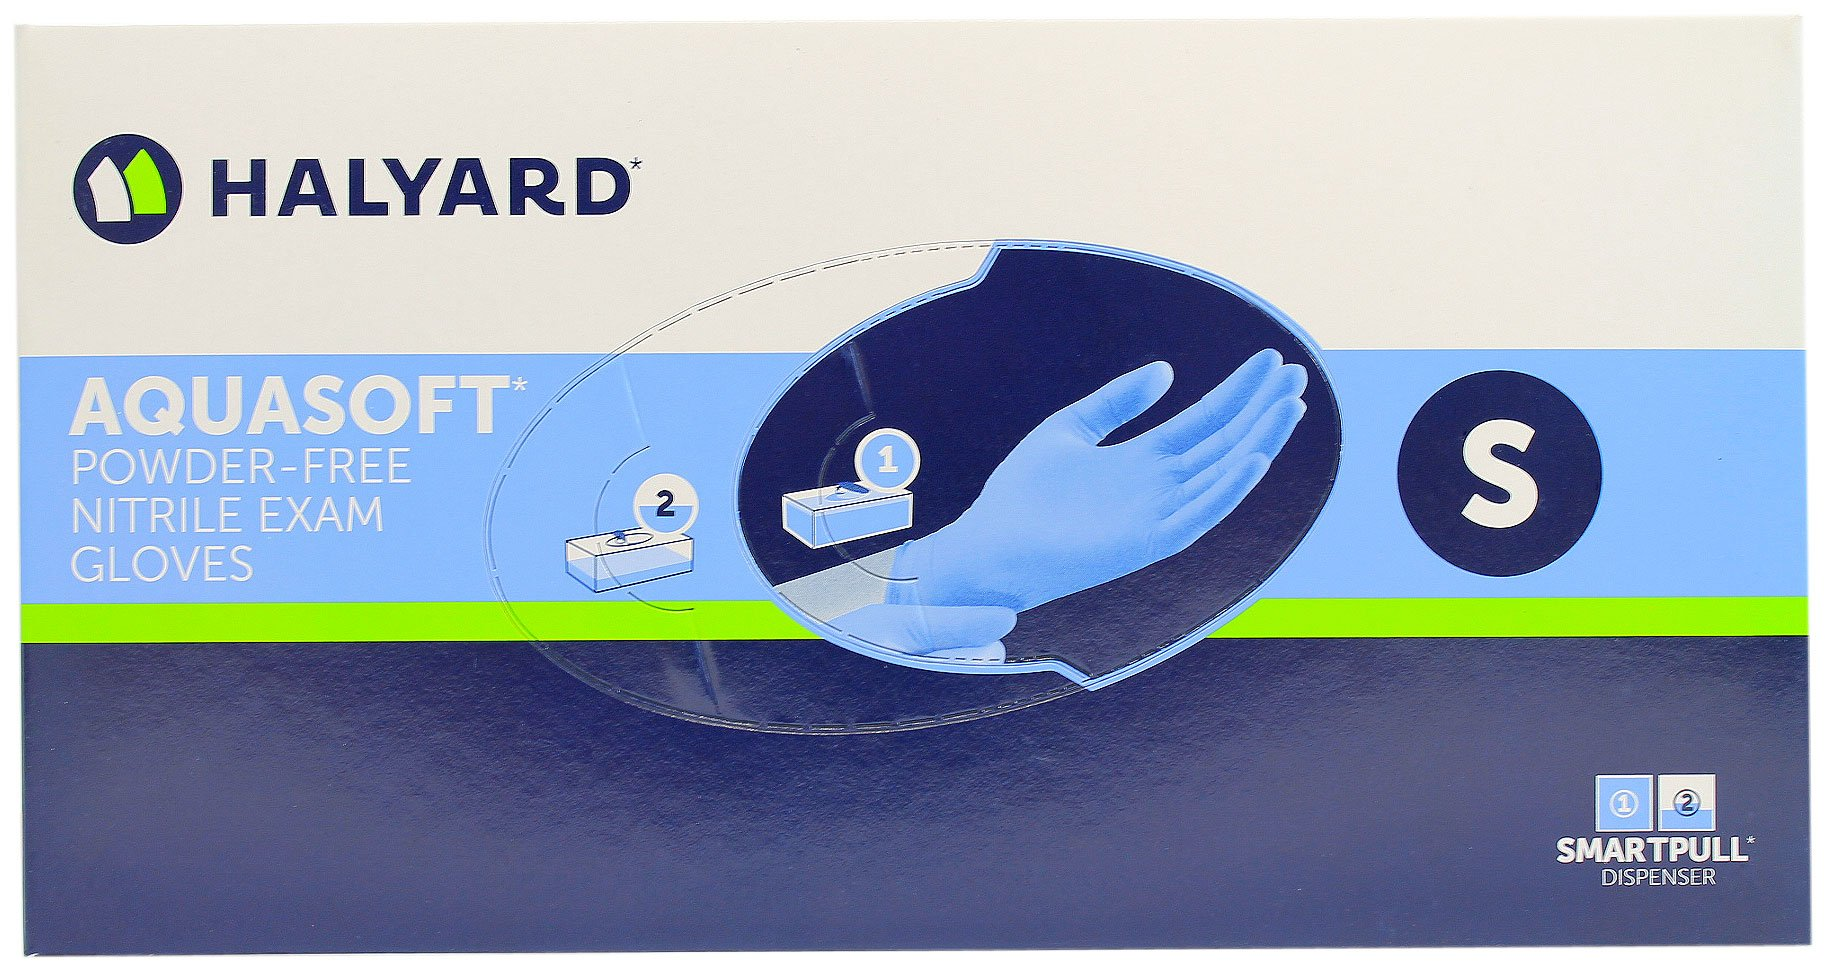 Halyard Health Aquasoft Nitrile Exam Glove - Powder Free - Small - Box of 300